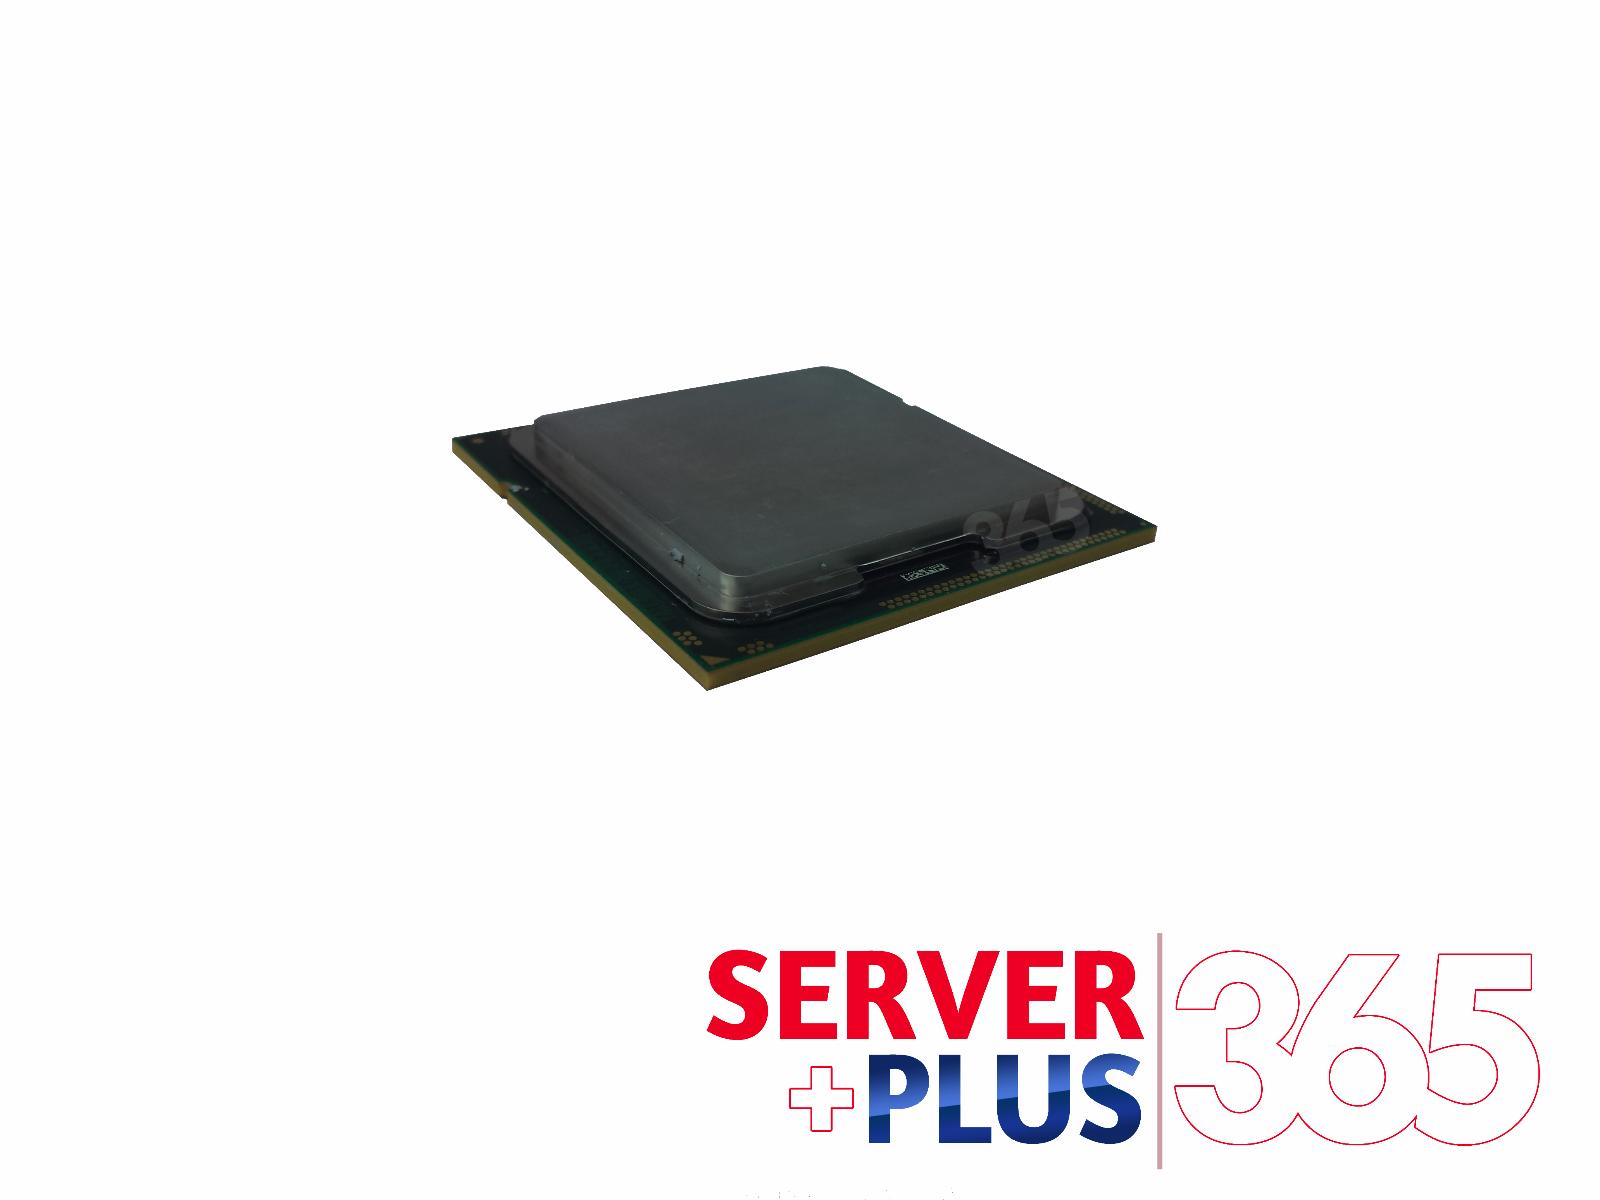 Intel-x5690-processor 12m cache 6.40 GT//s QPI 3.46 GHz